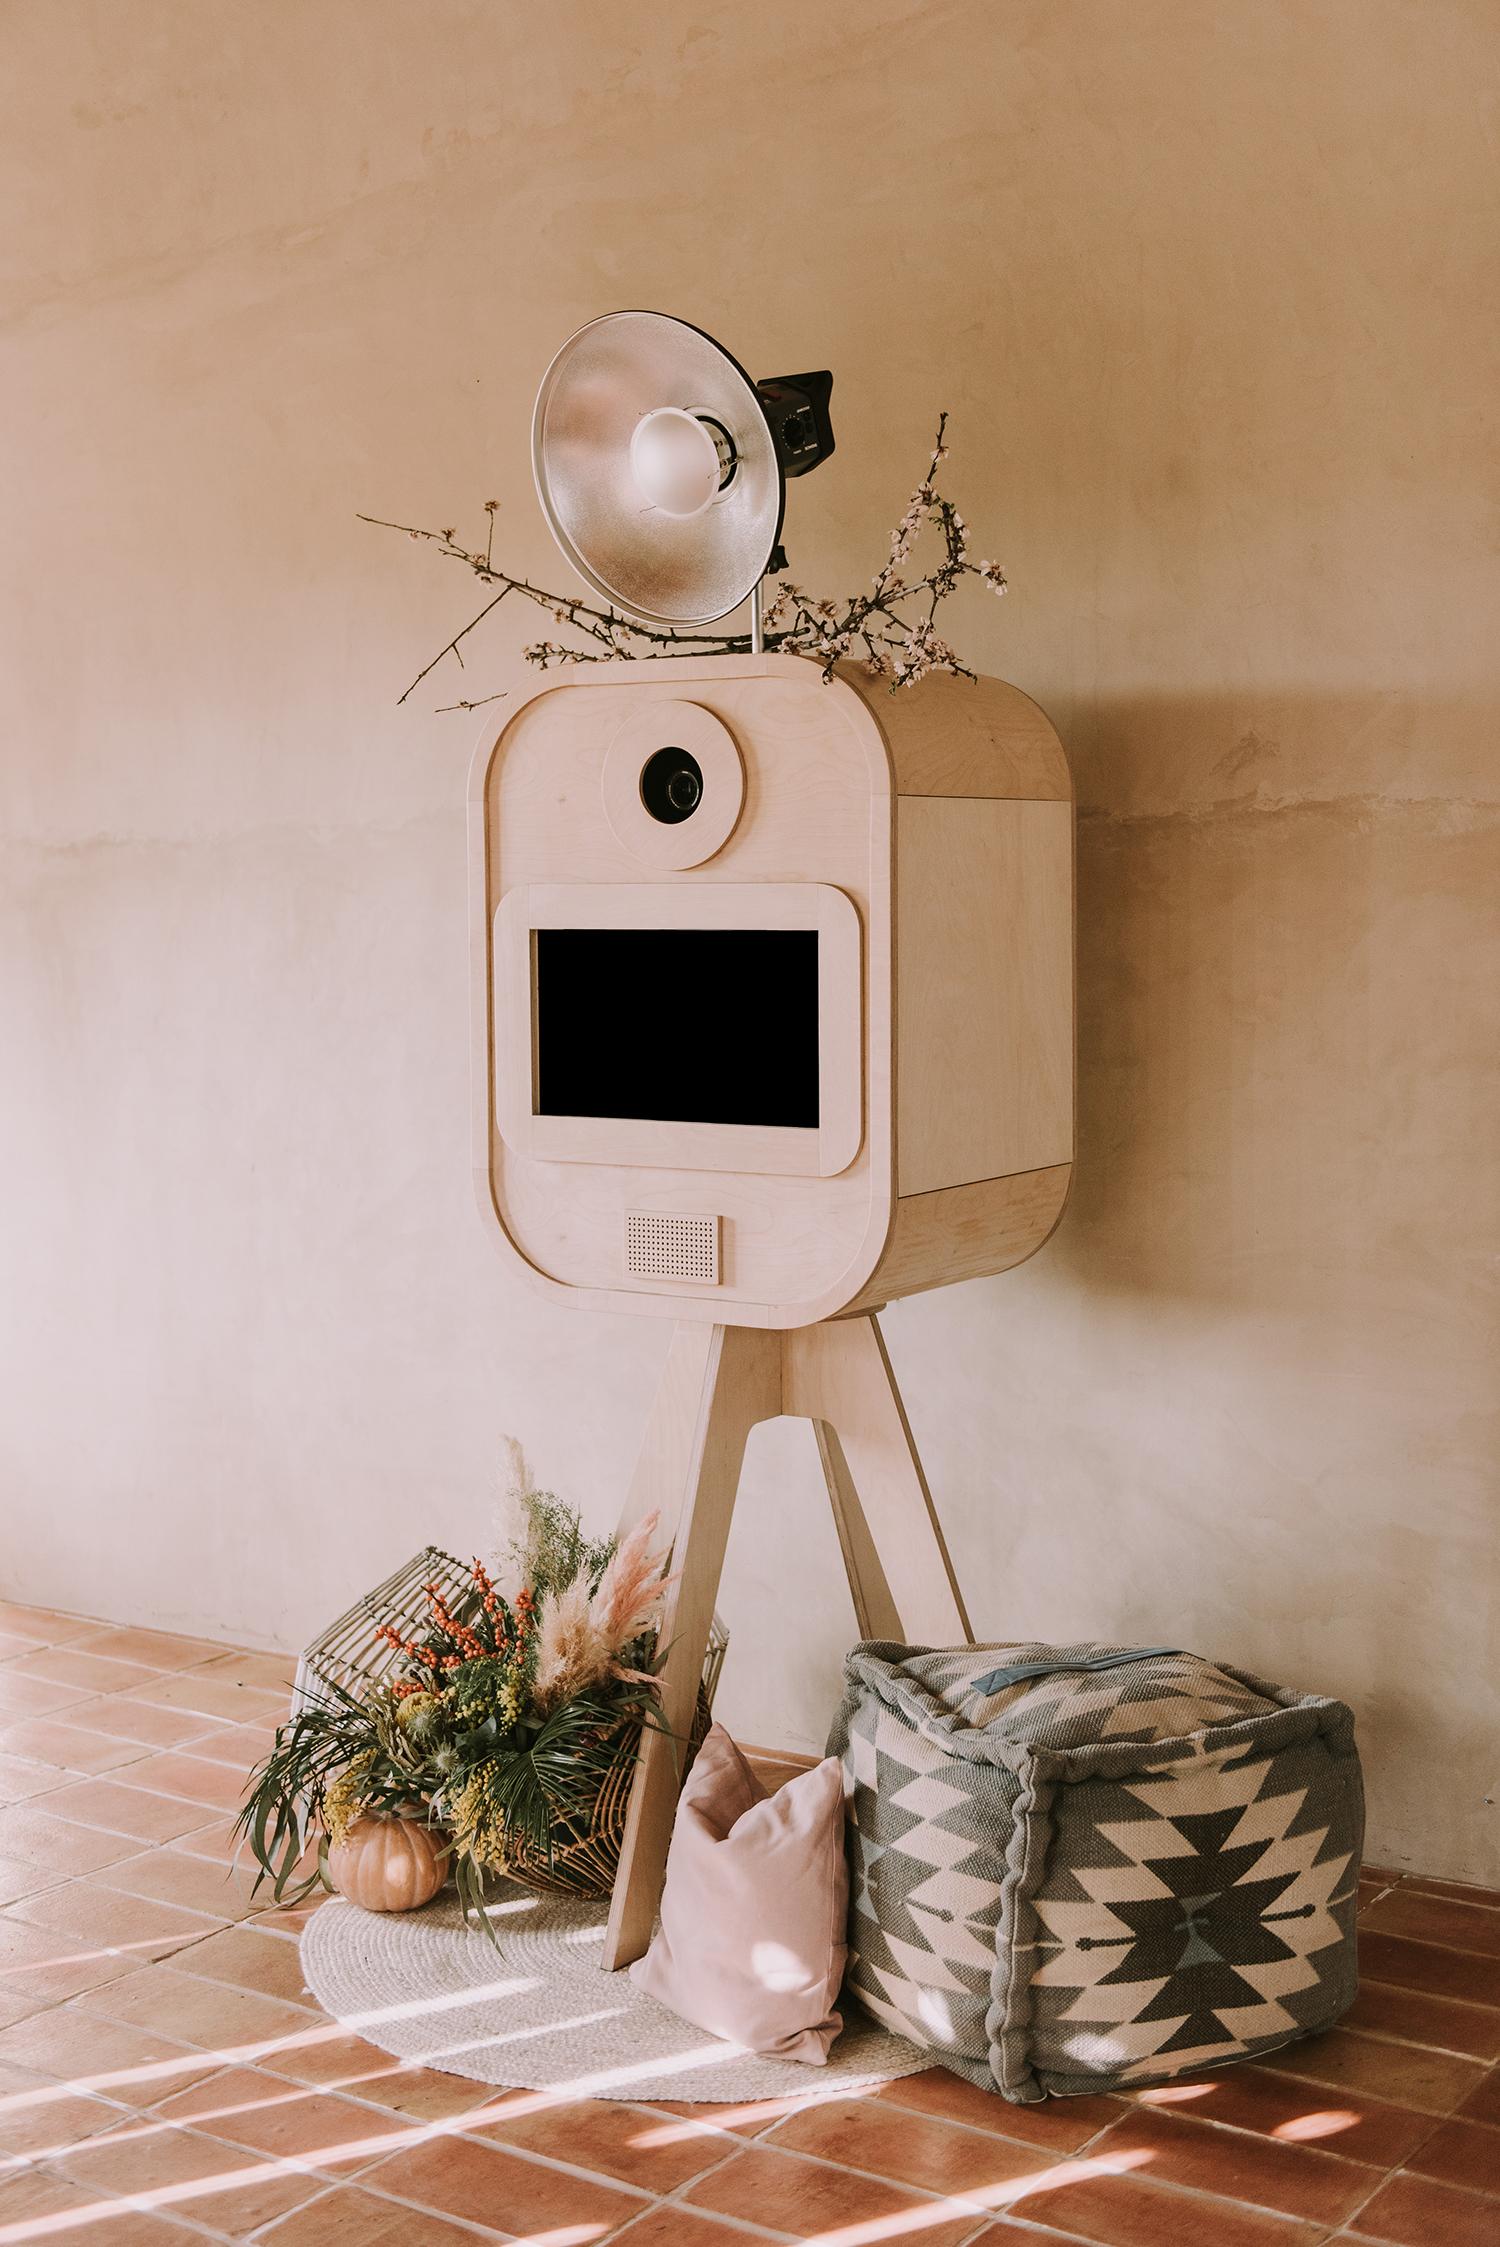 Photobooth and photocall for weddings in Girona.